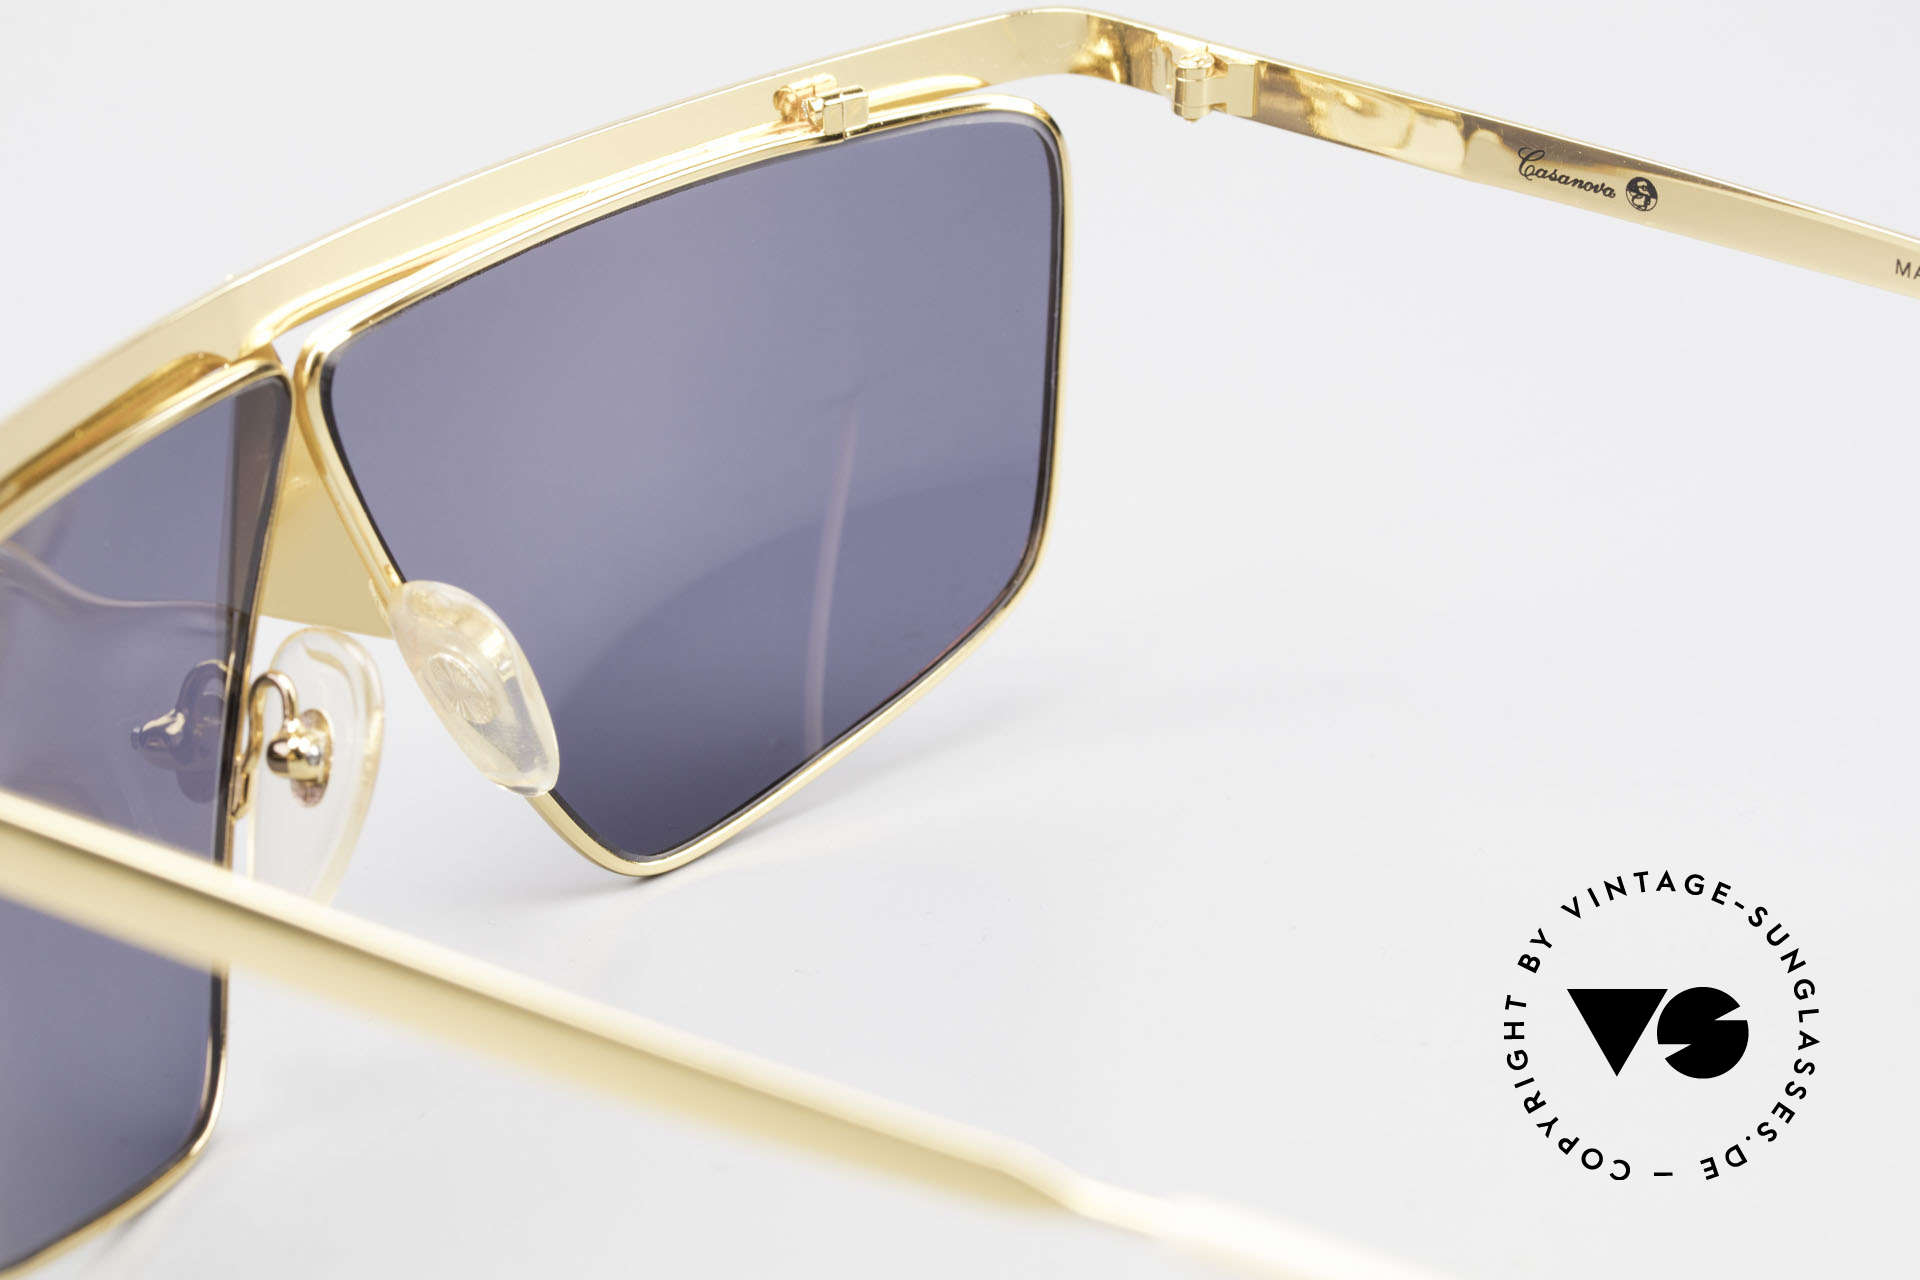 Casanova FC10 Noseguard Sunglasses 24kt, NOS - unworn (like all our artistic vintage eyeglasses), Made for Men and Women